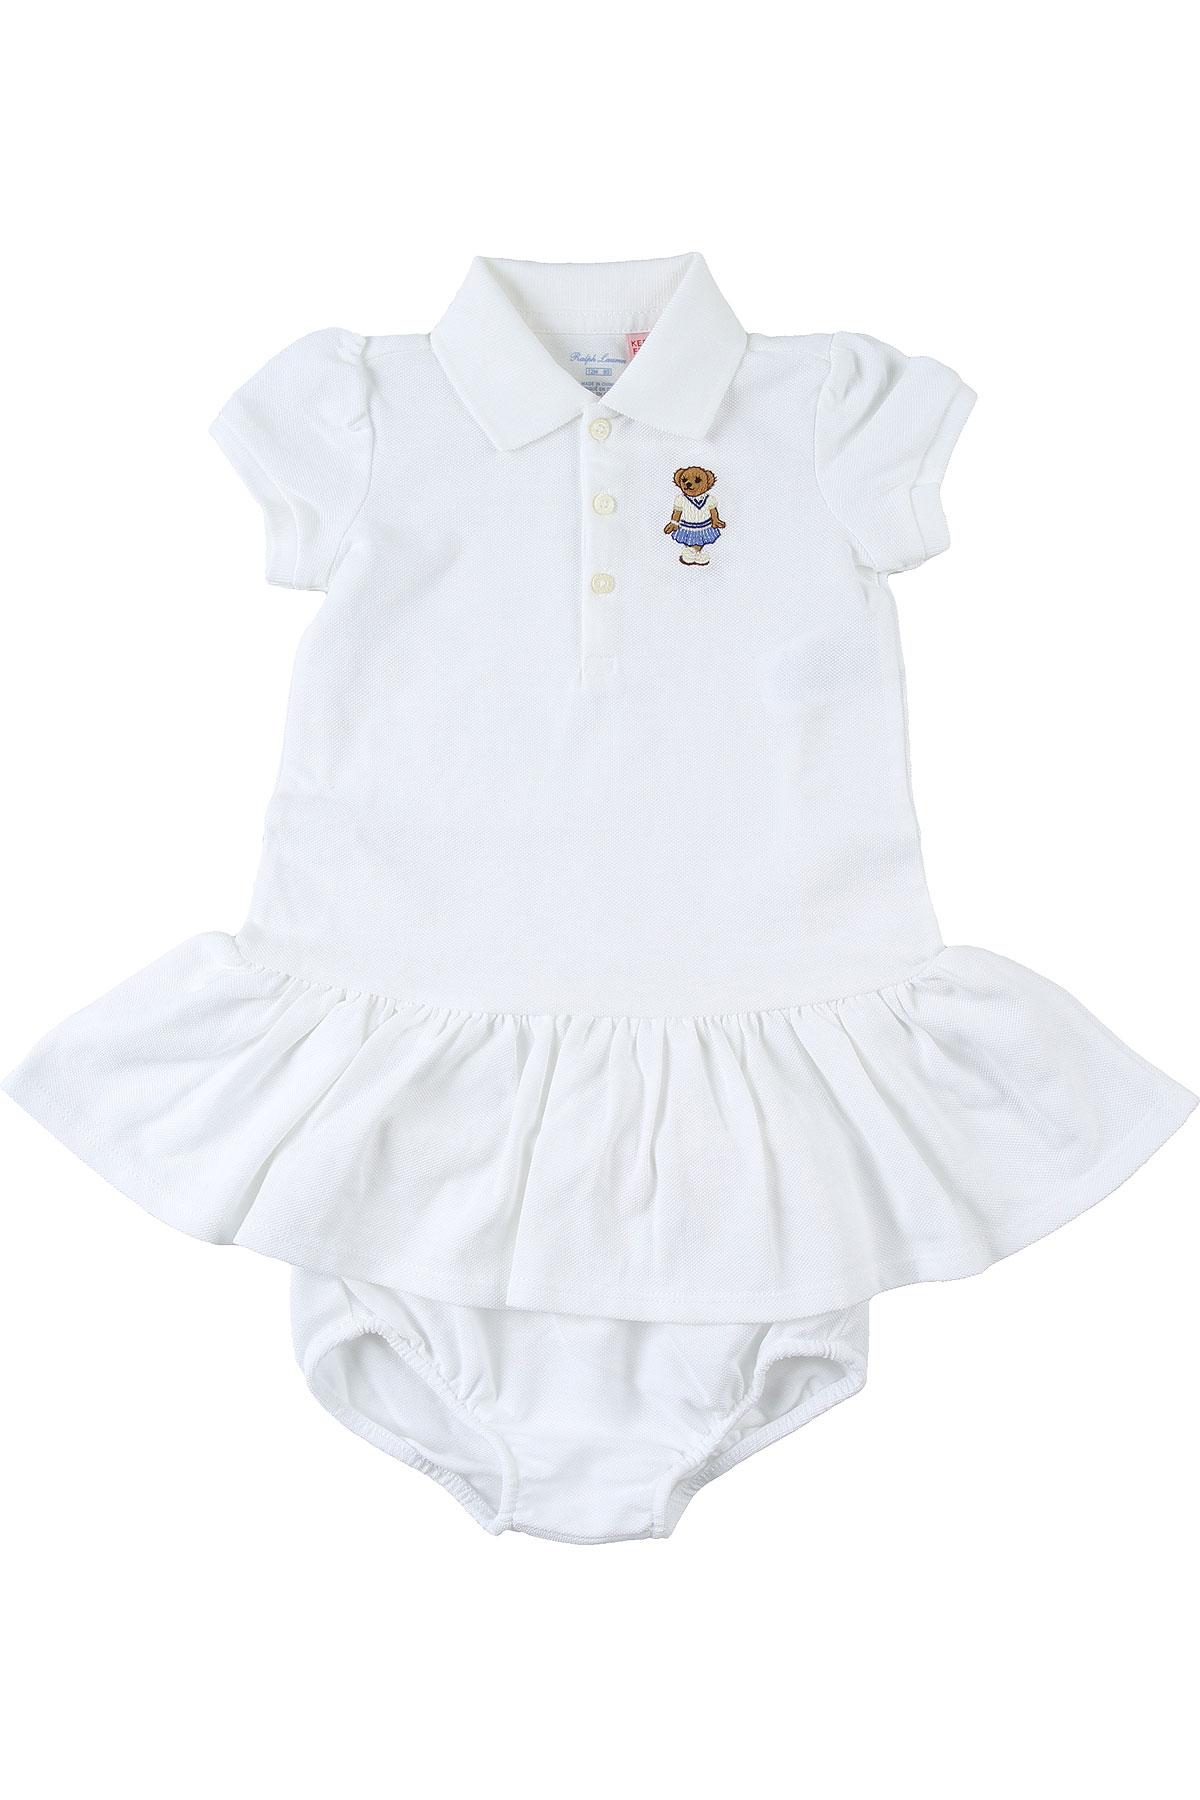 Ralph Lauren Baby Dress for Girls On Sale, White, Cotton, 2019, 12M 2Y 6M 9M